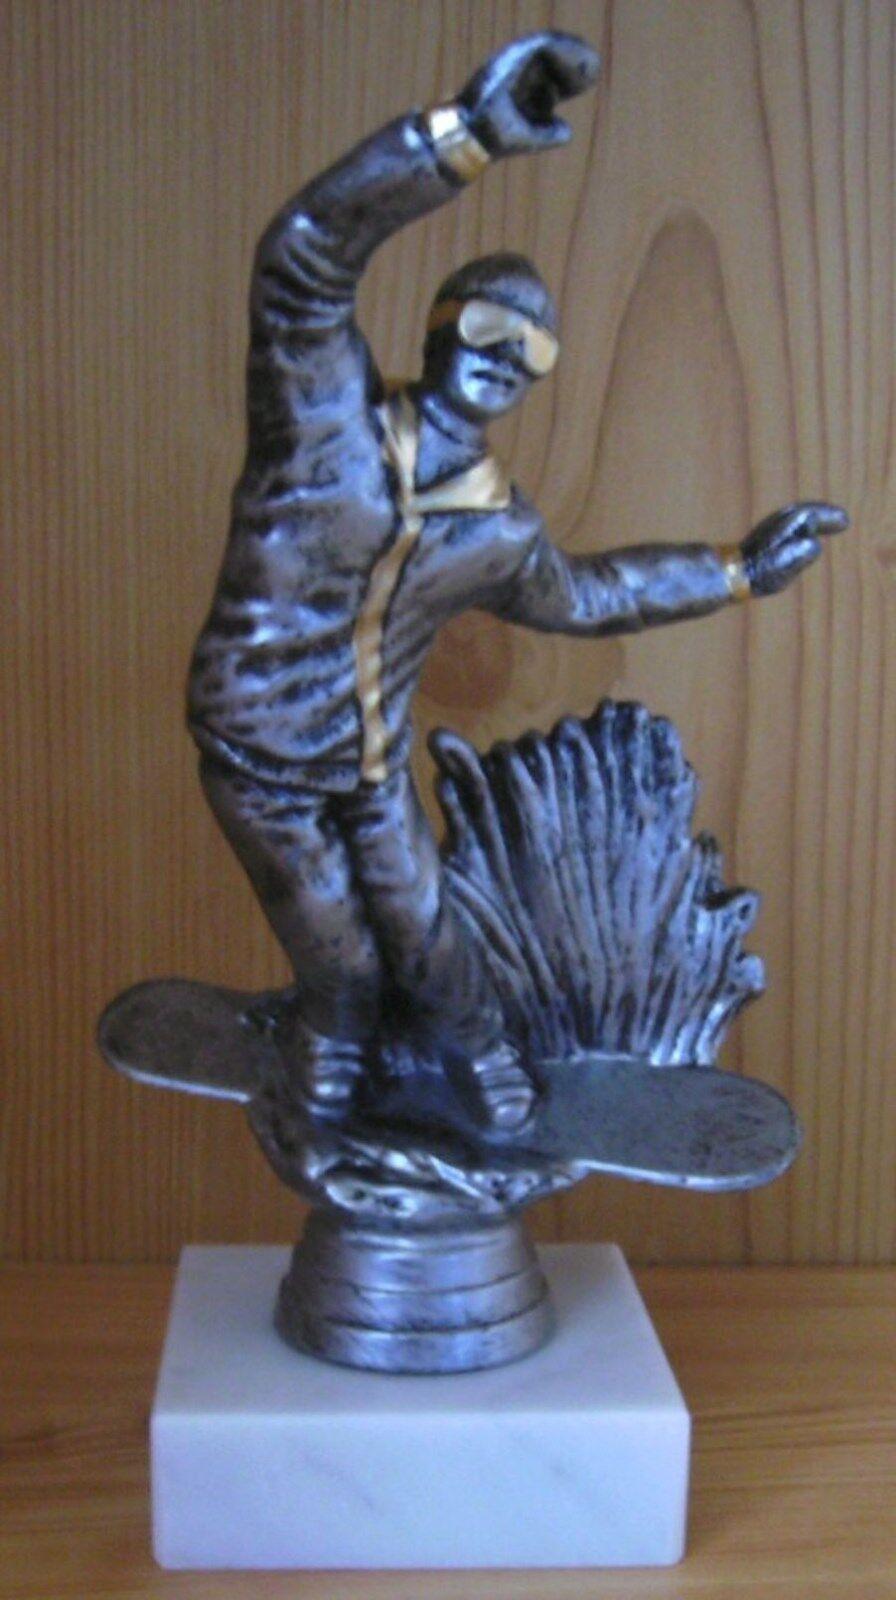 10 Snowboard Snowboard Snowboard Wintersport Pokal-Figuren (Ski Pokale Turnier Sieger Gravur Schnee) cc9b81